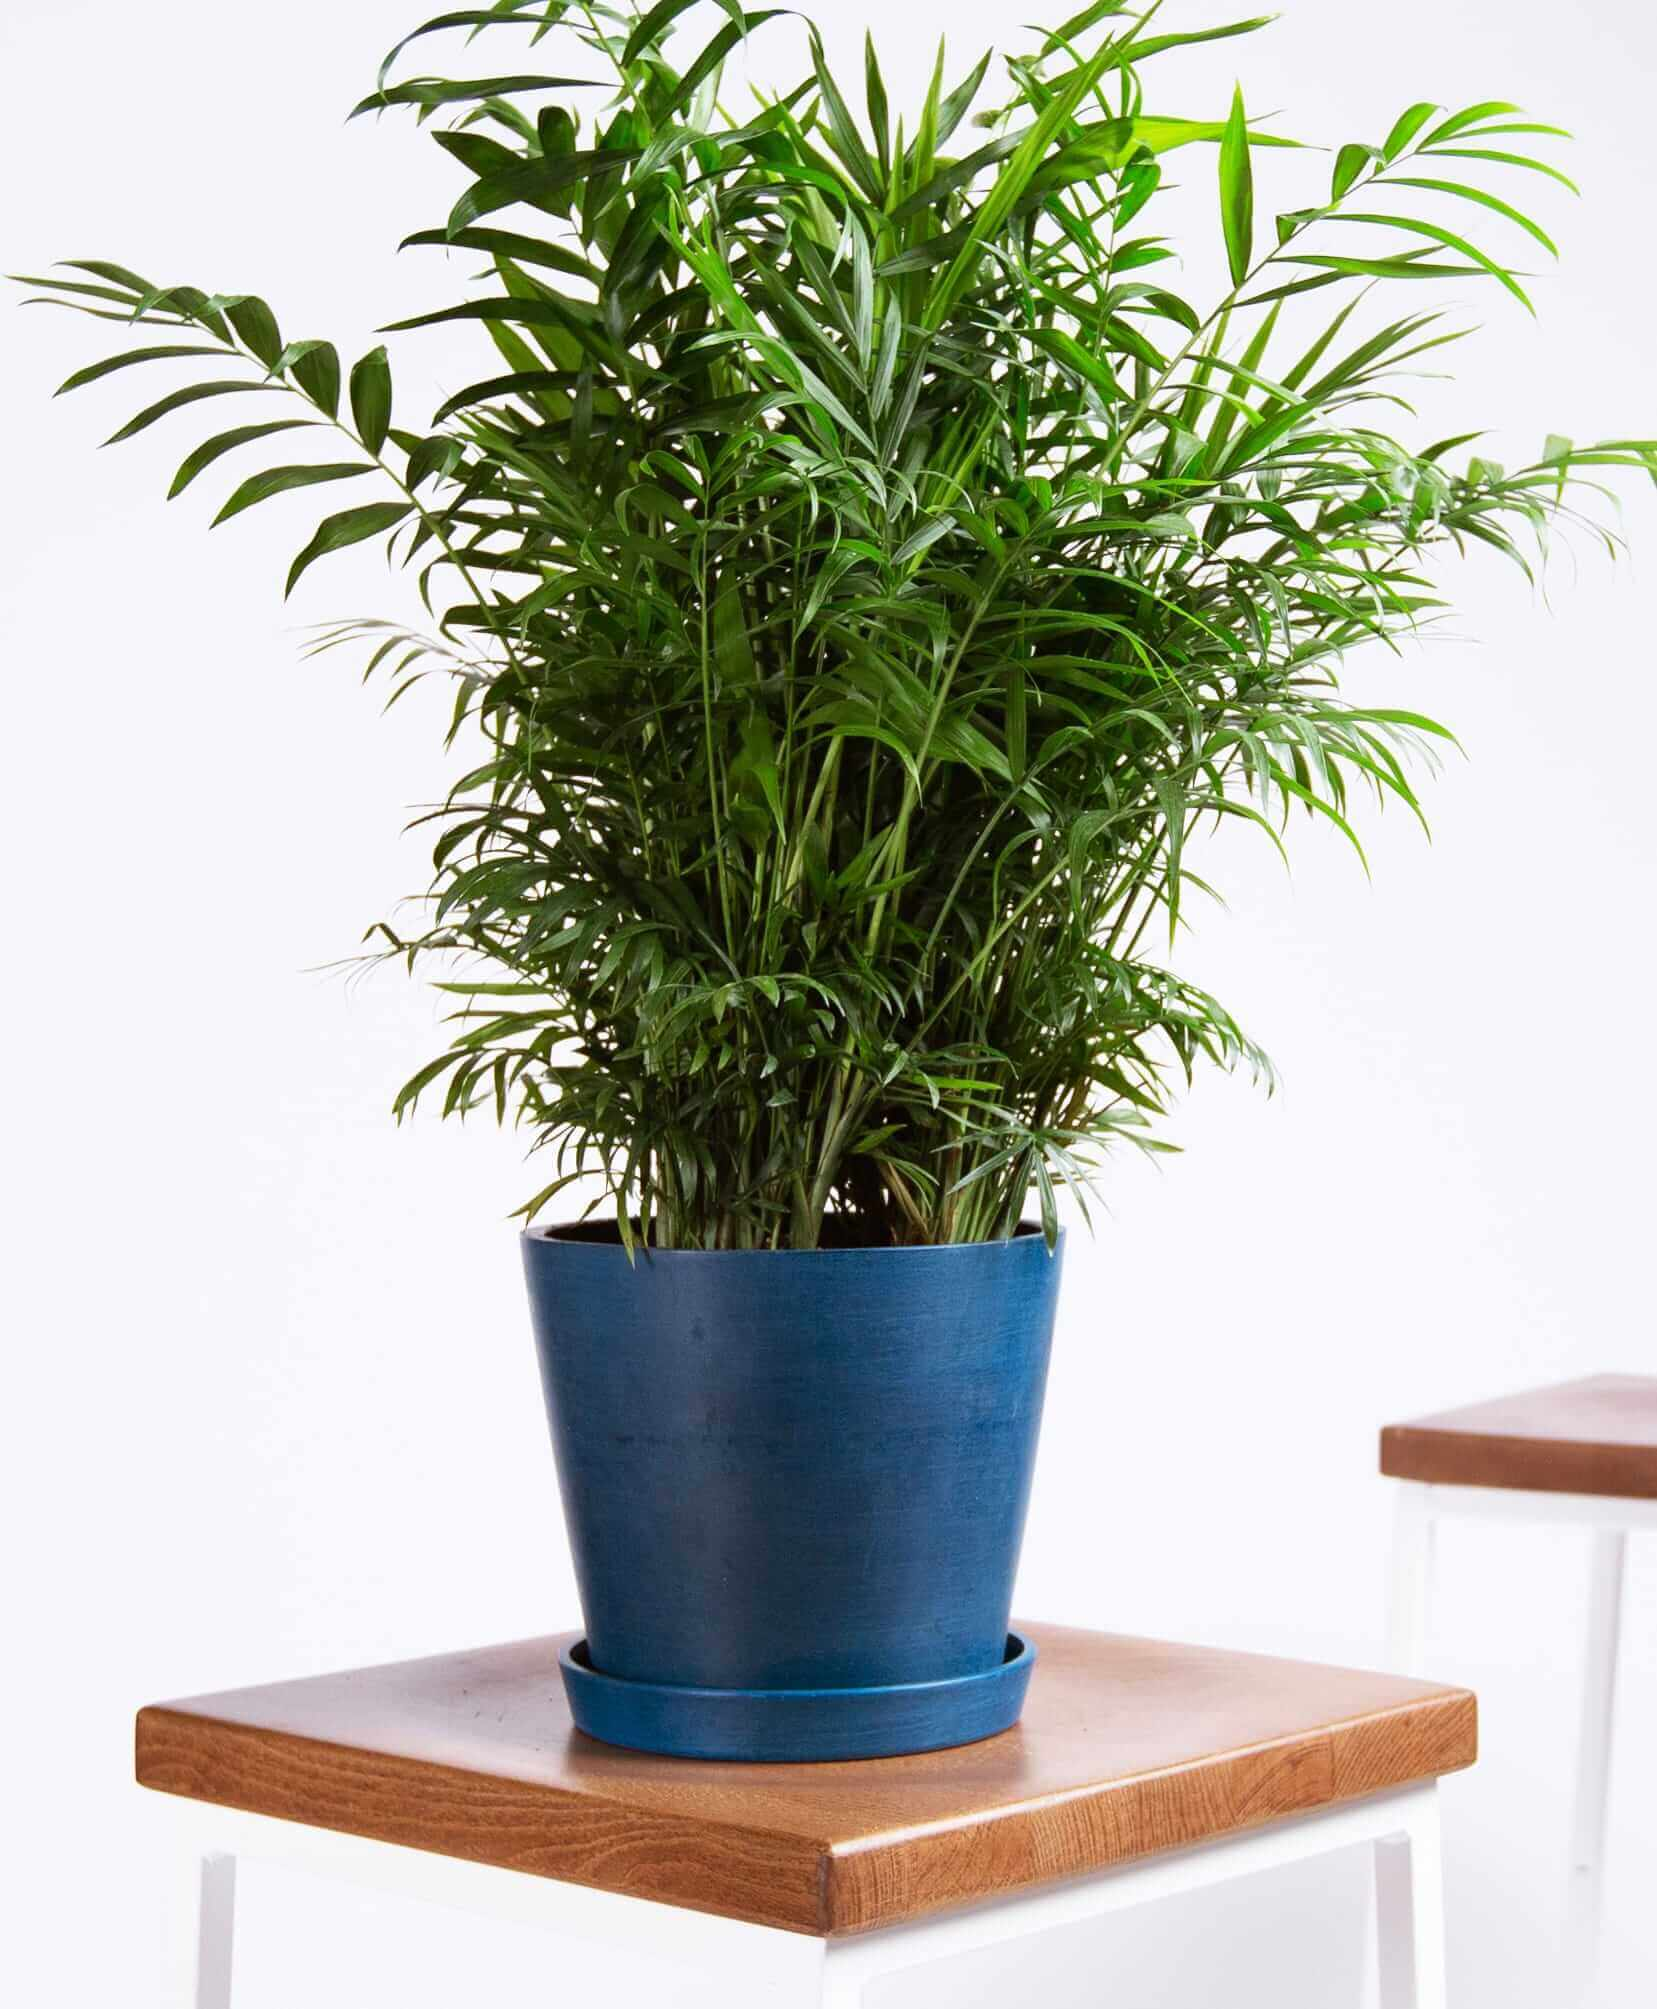 bloomscape_product-parlor-palm-indigo